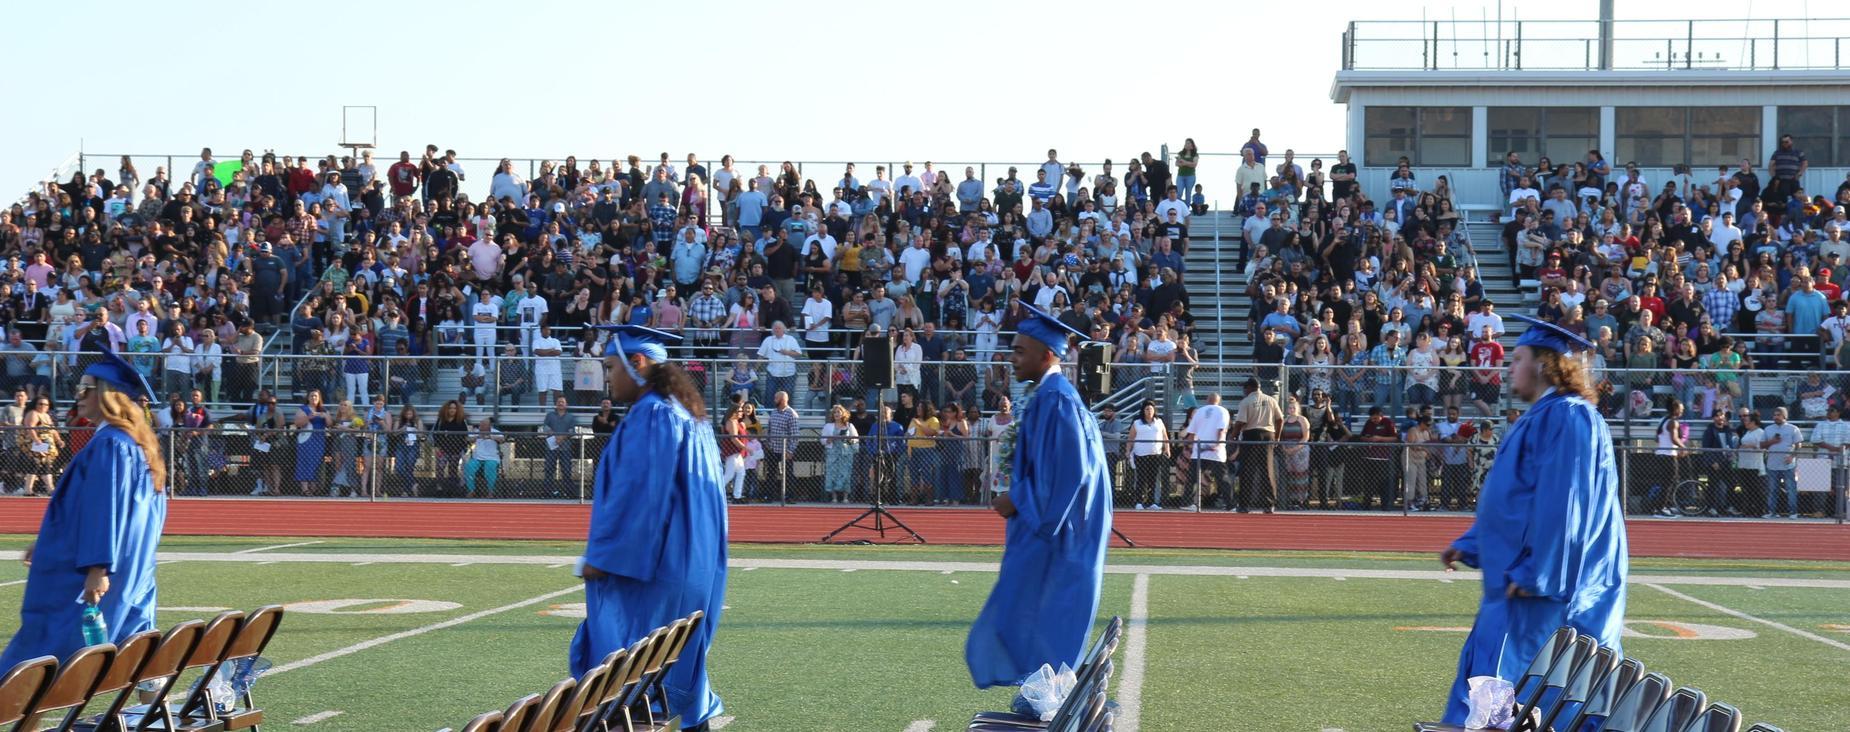 MVHS Graduation 2019